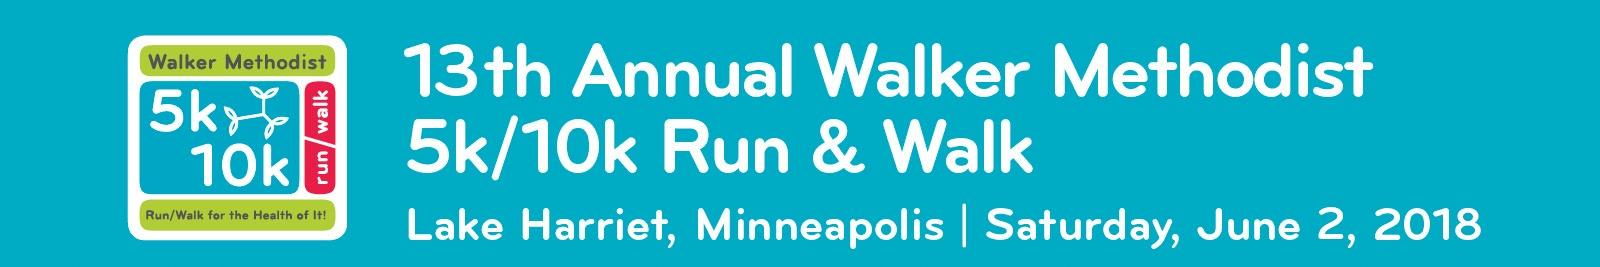 Walk Run_WebBannerC_2018_1-header